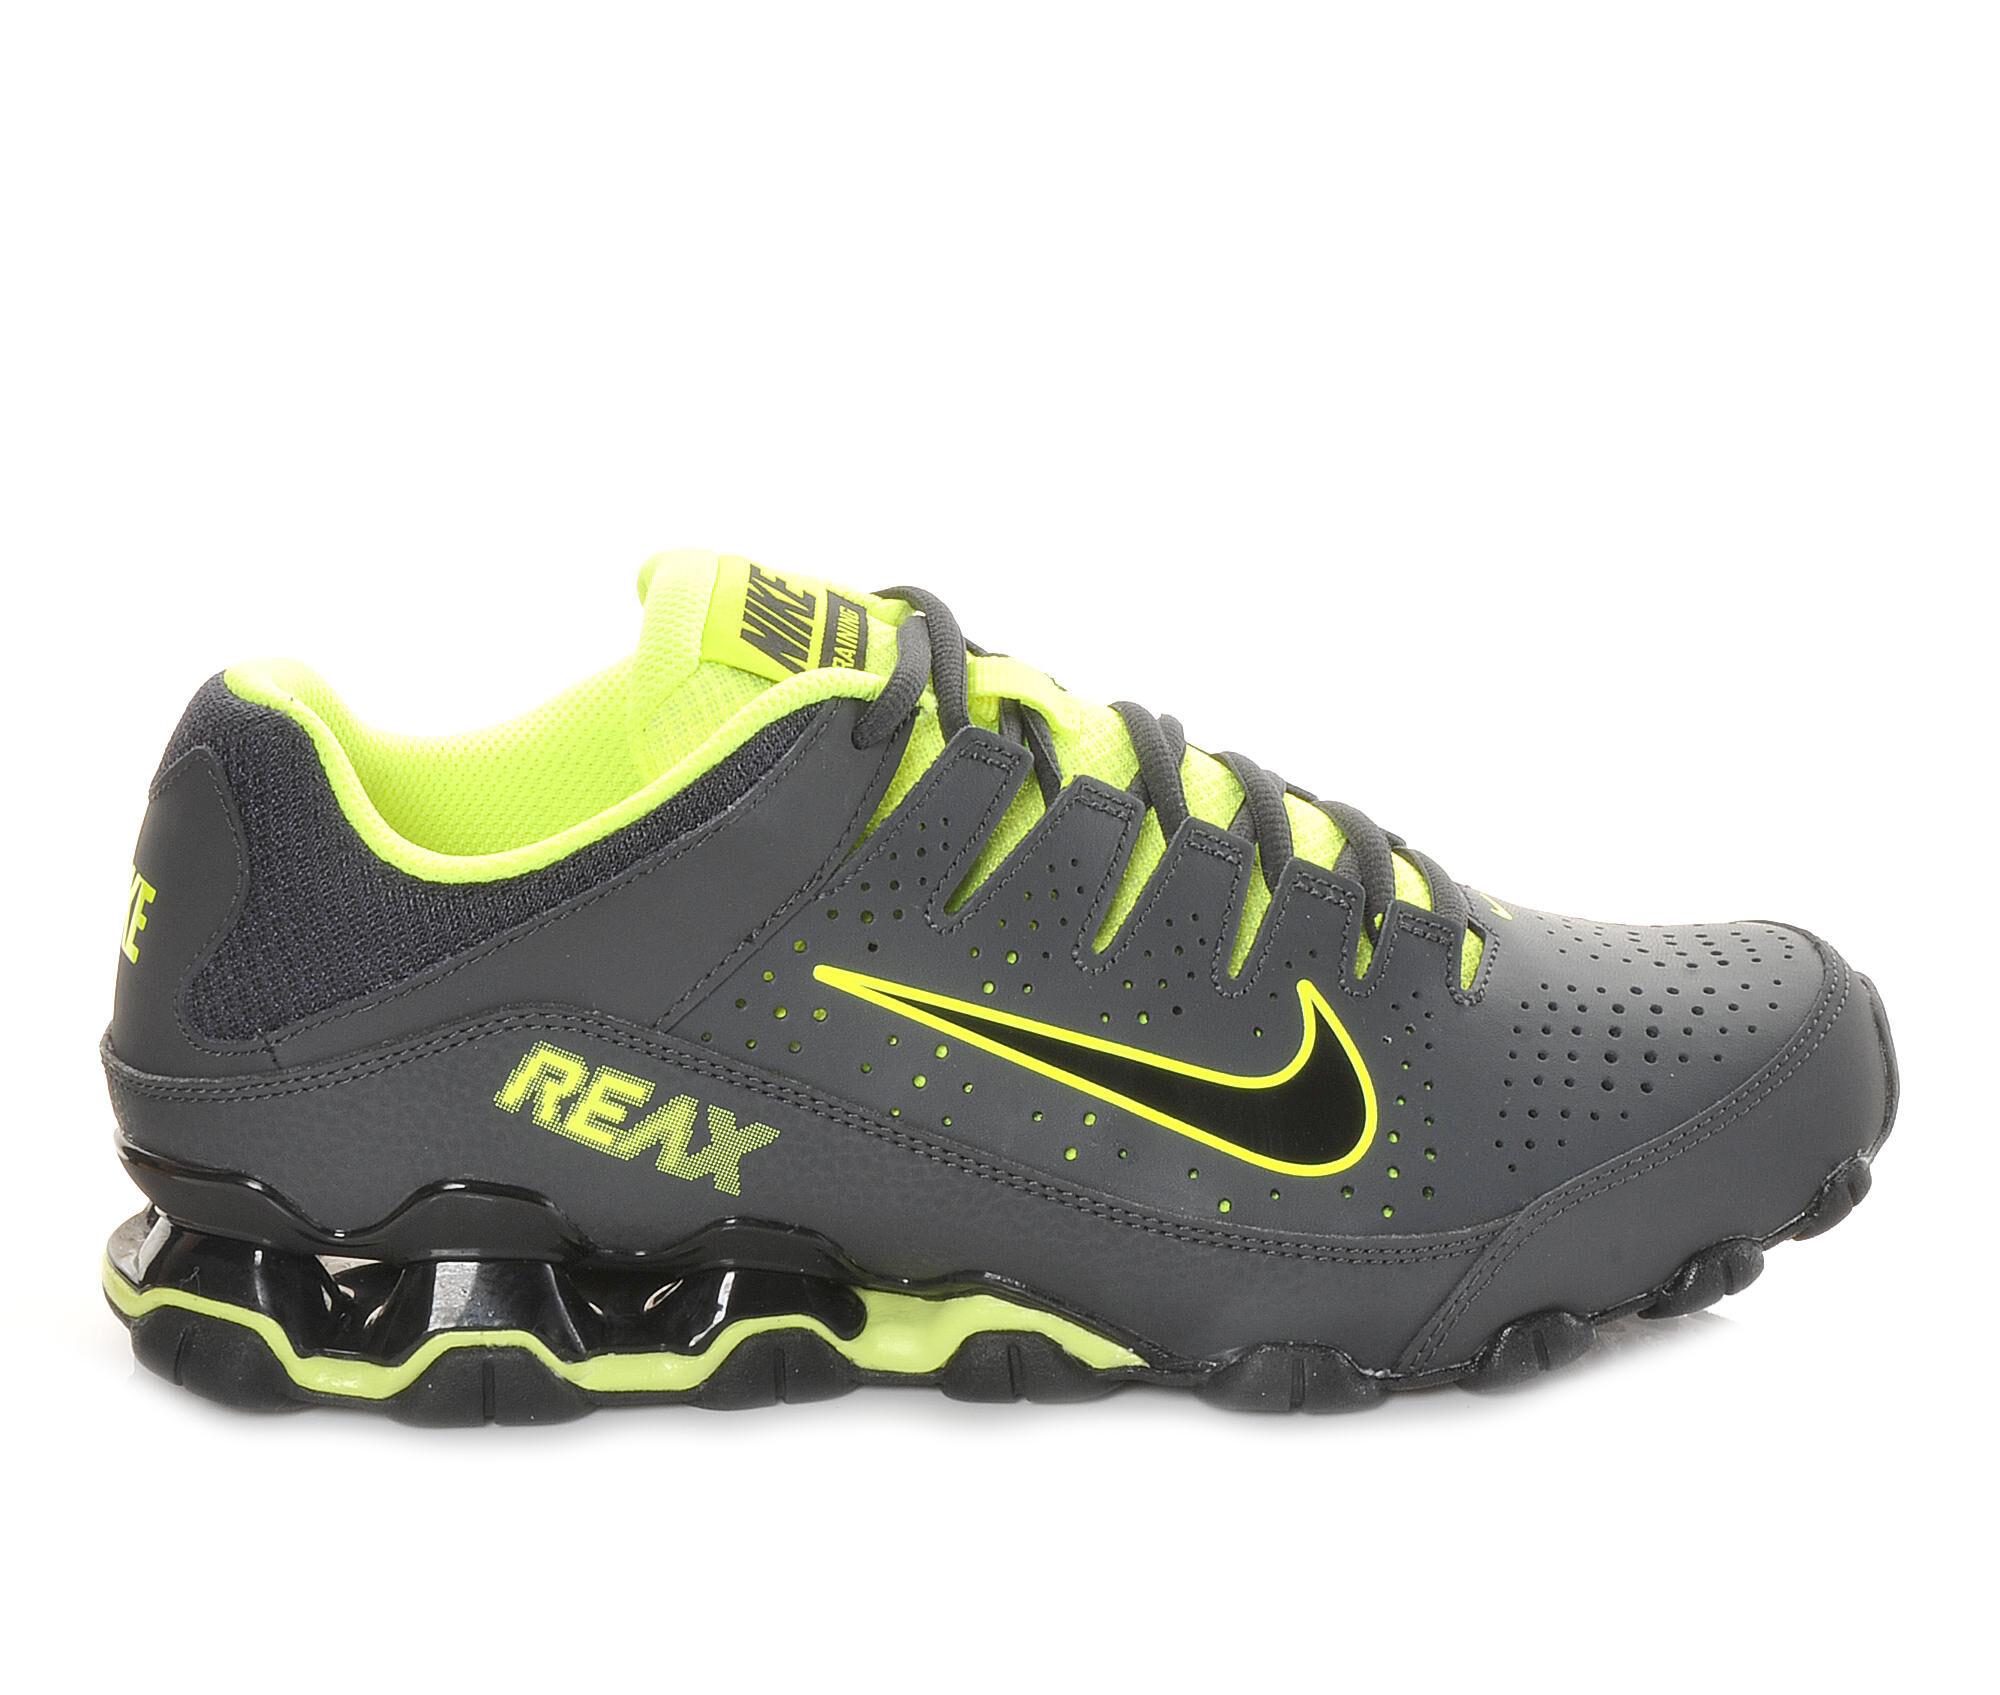 good price Men's Nike Reax 8 TR Training Shoes Anth/Blk/Volt